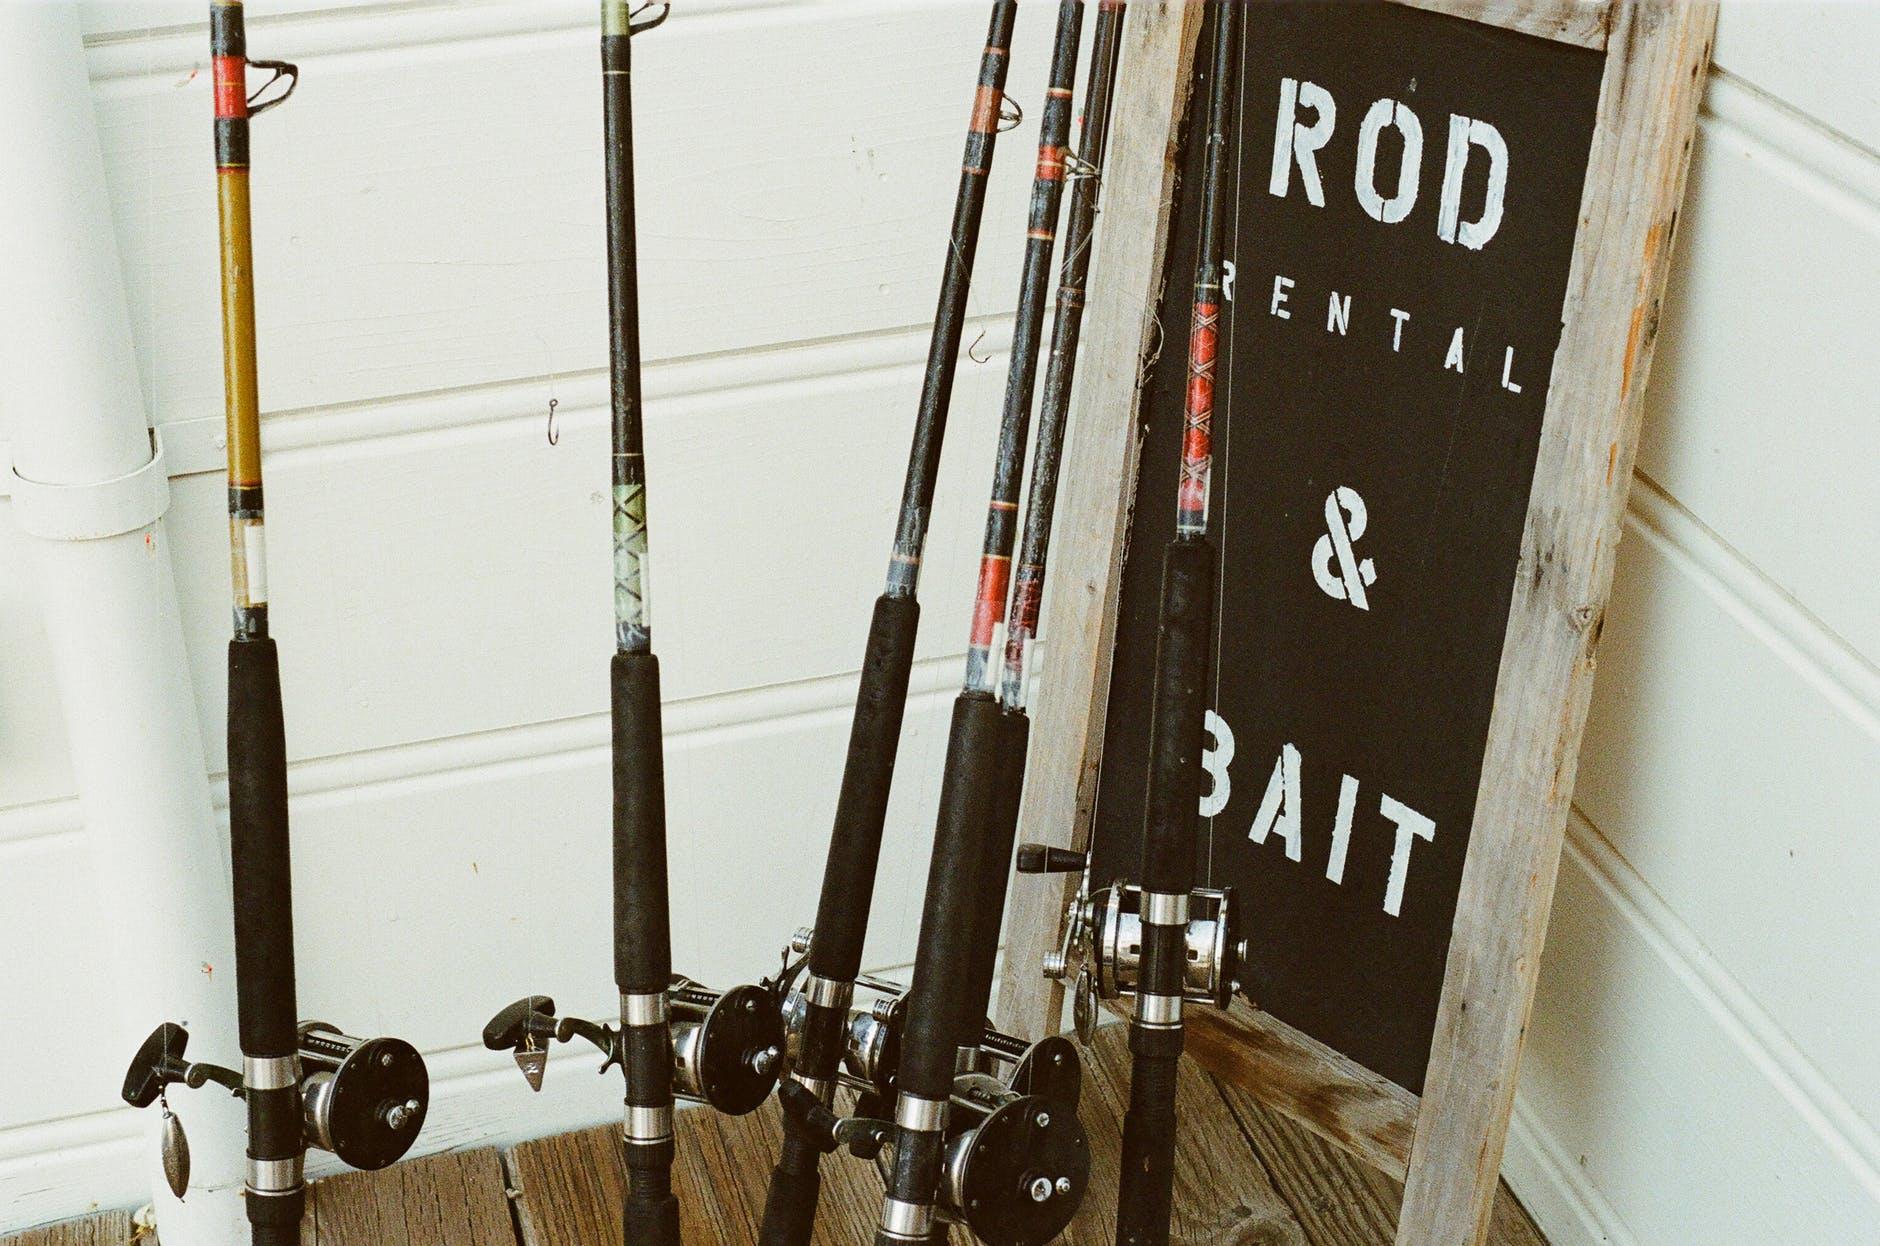 fishing-fishing-tackle-fisherman-bait.jpg